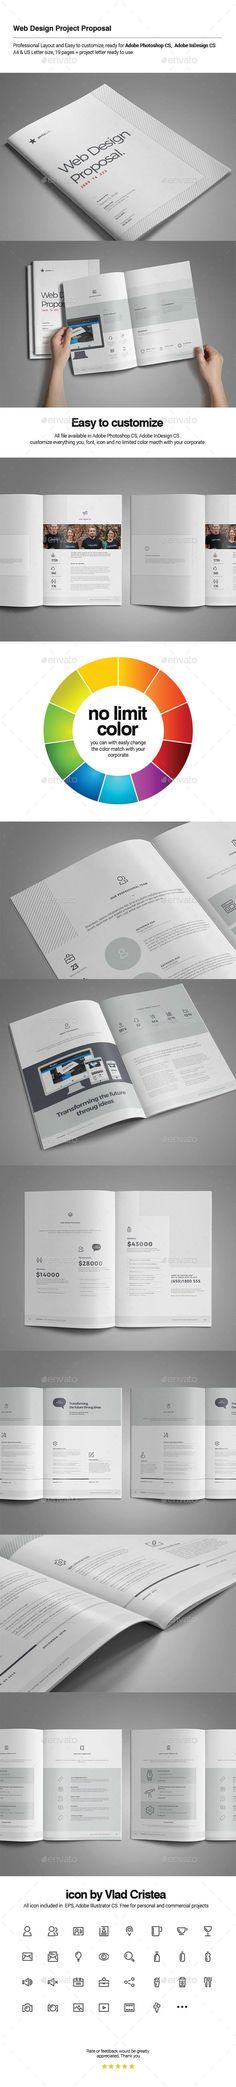 Website Design Proposal Template Web Design Proposal  Proposals Stationery Templates And Template